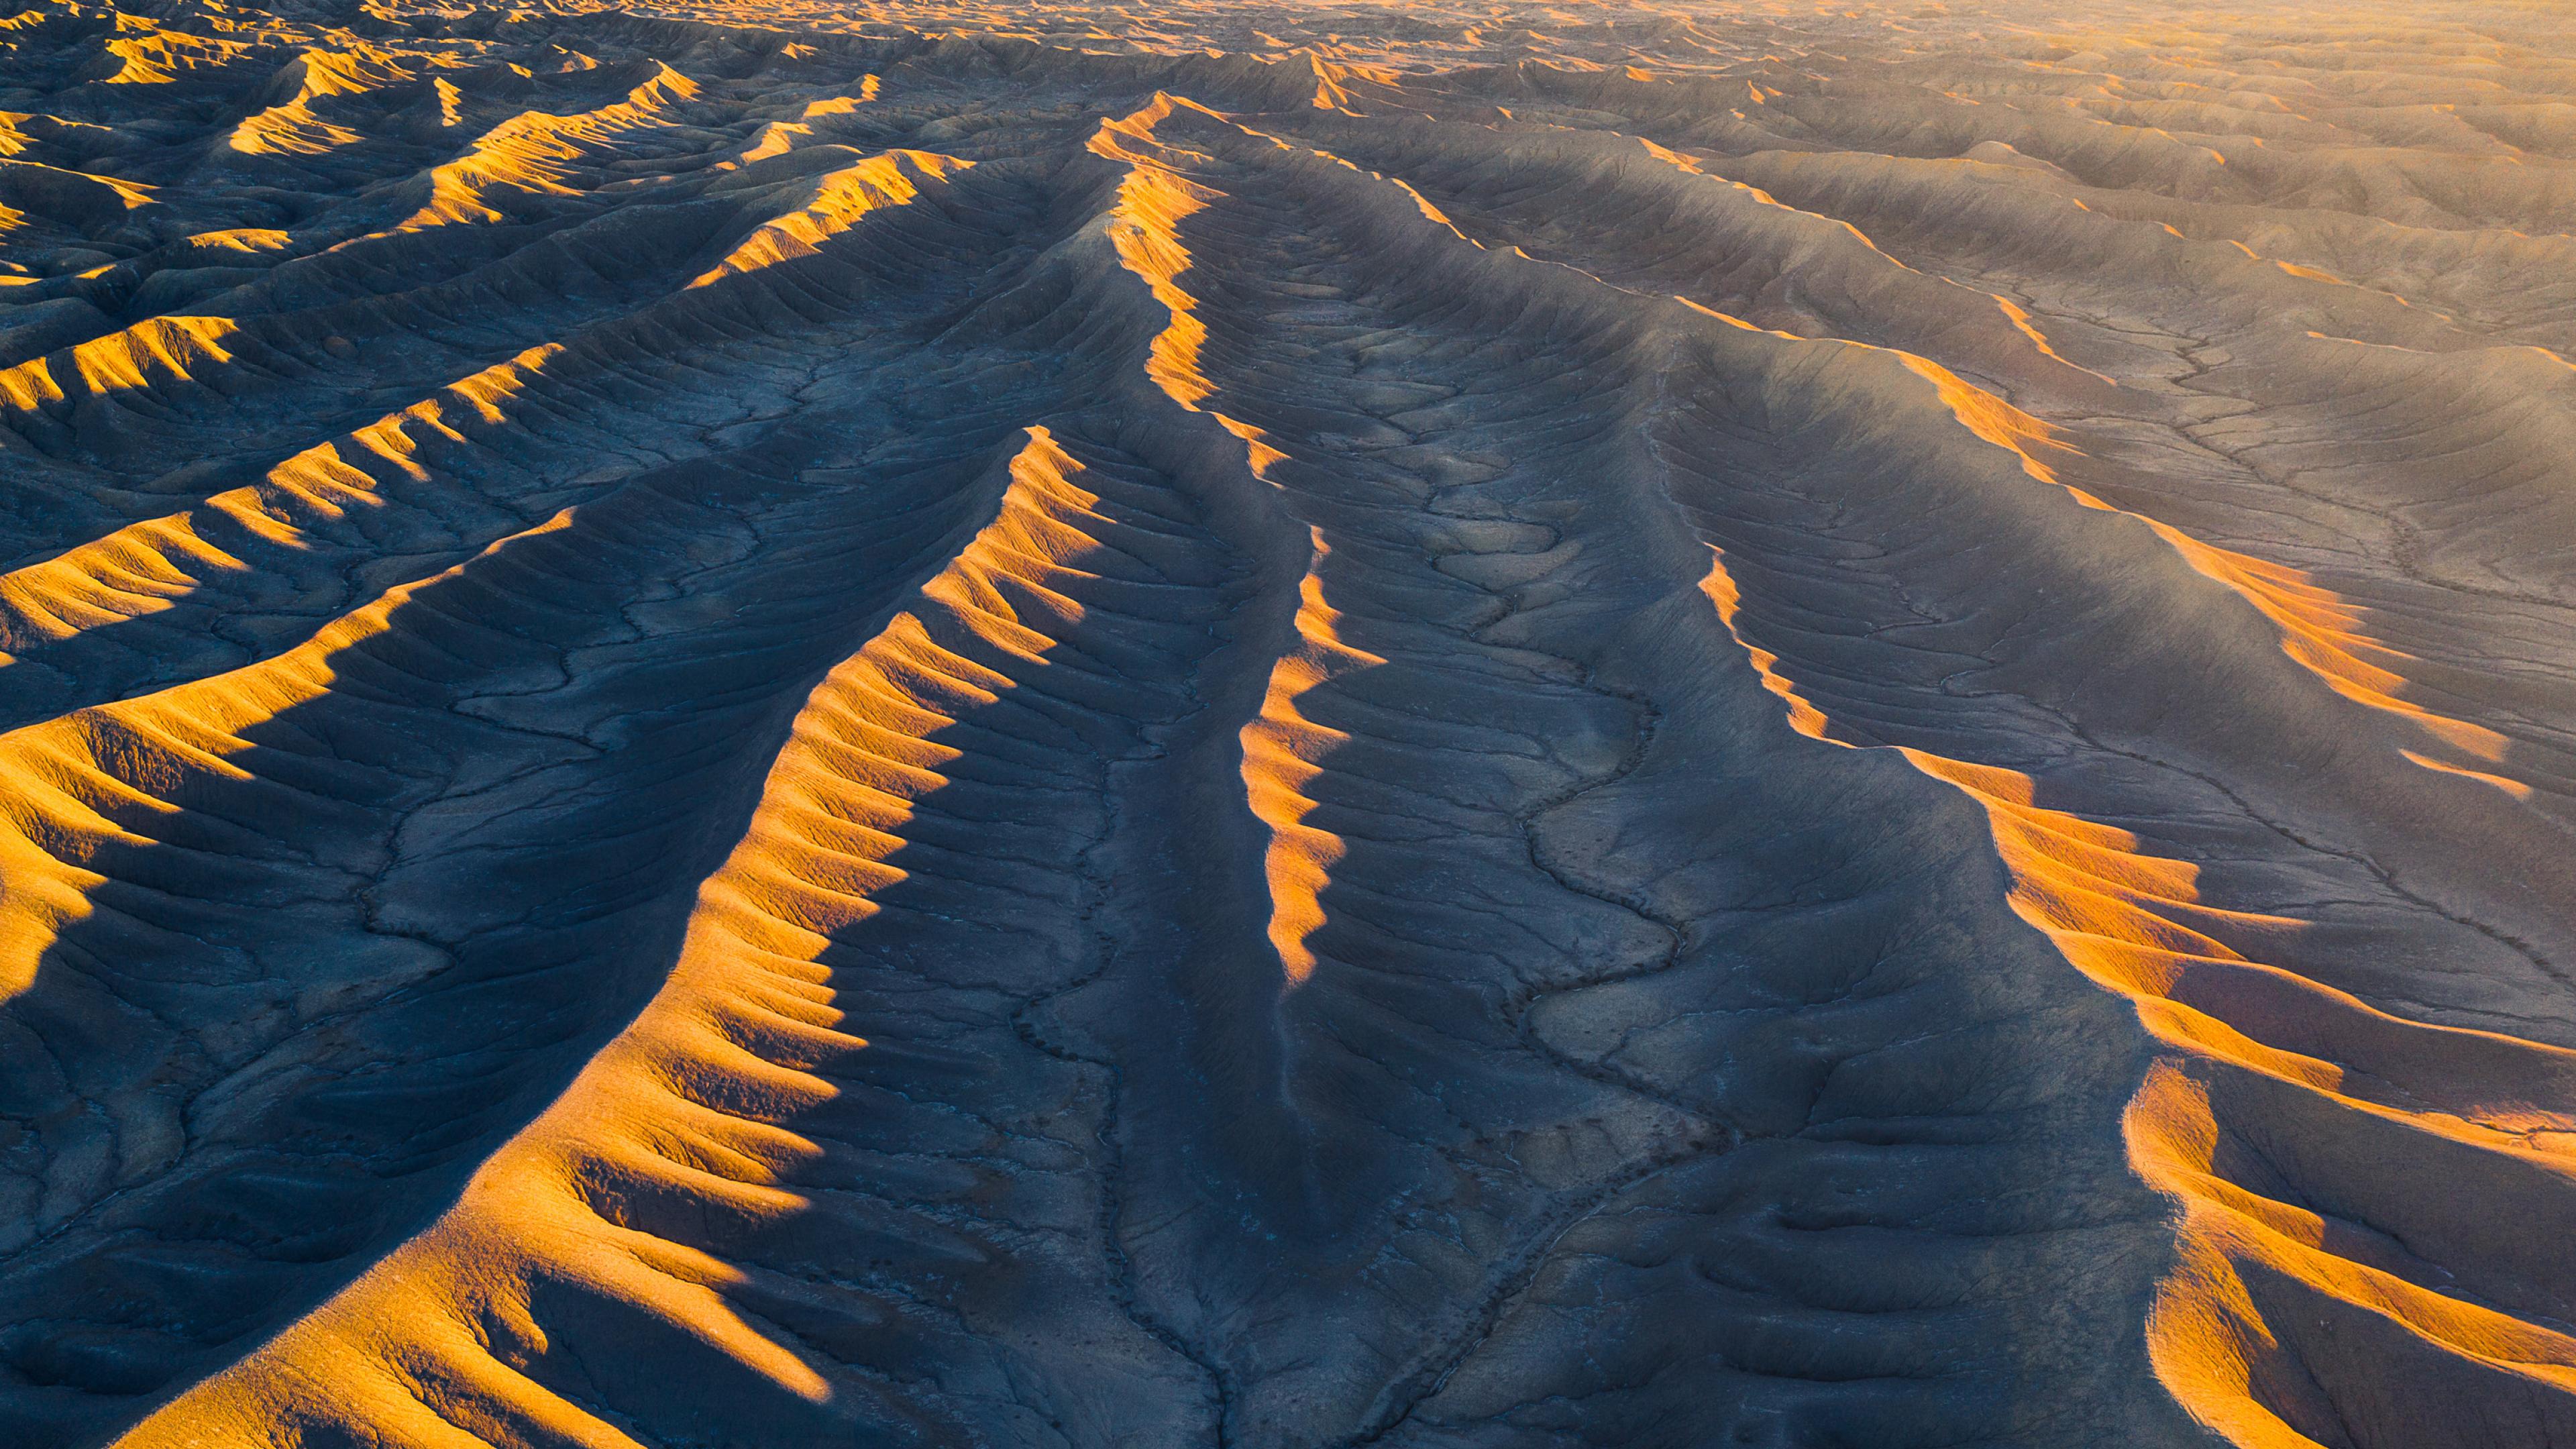 Aerial View From Utah Desert Wallpaper in 3840x2160 Resolution